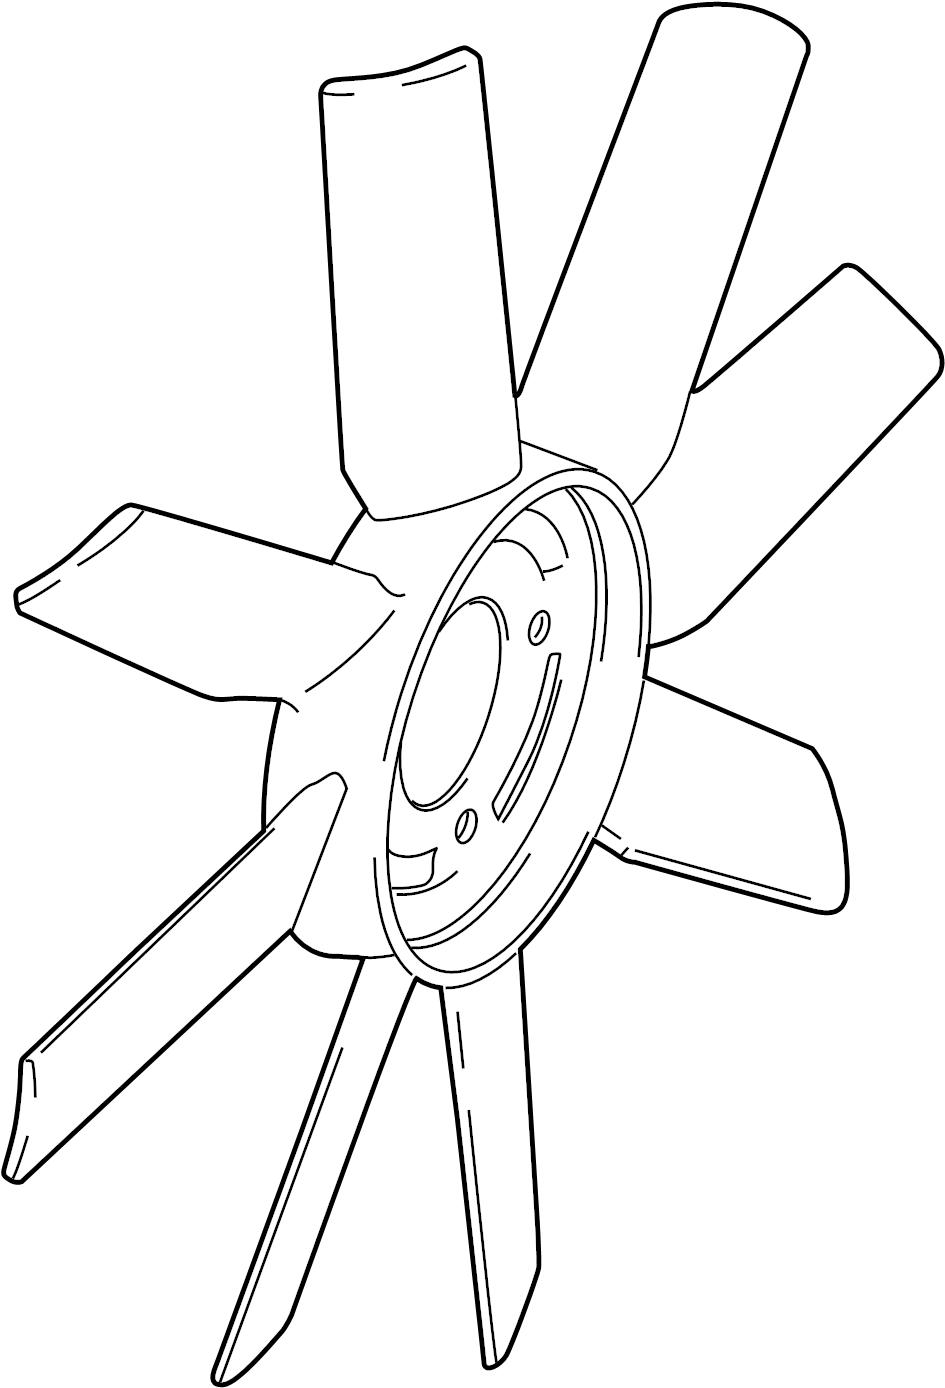 Mazda B2300 Engine Cooling Fan Clutch Blade. Fan. Cooling